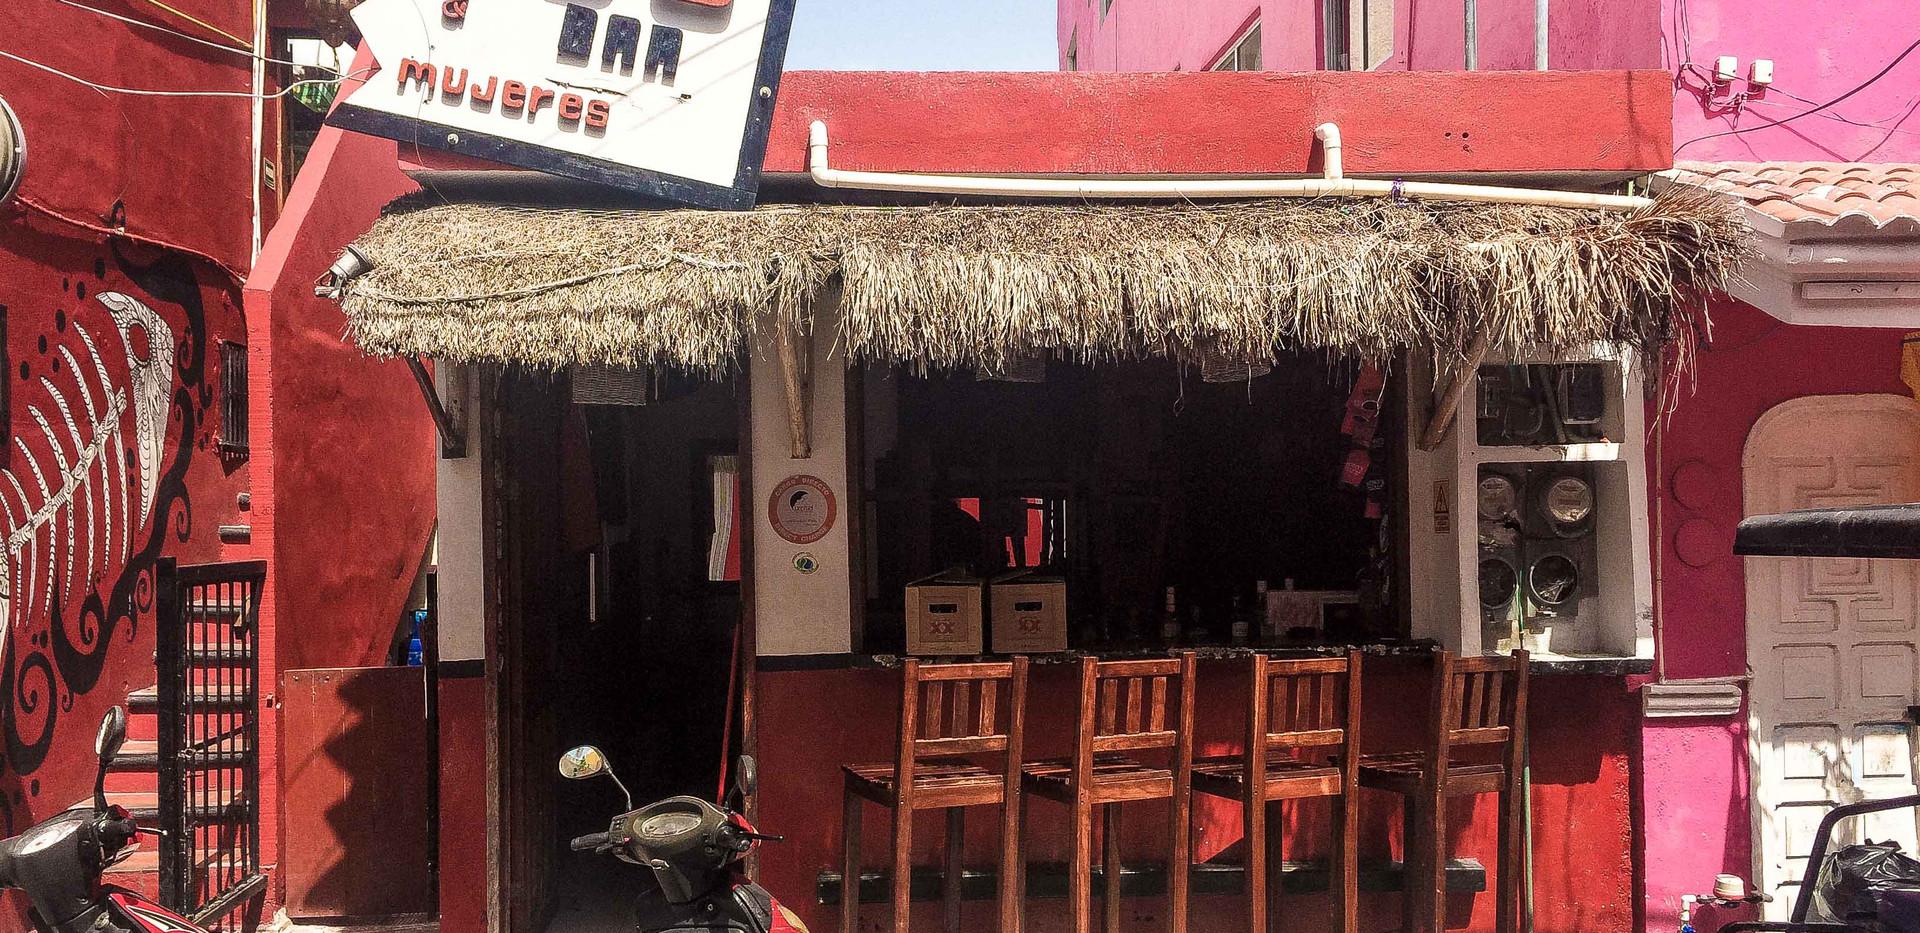 Bobos-tasteofisla-islamujeres-food-tacos